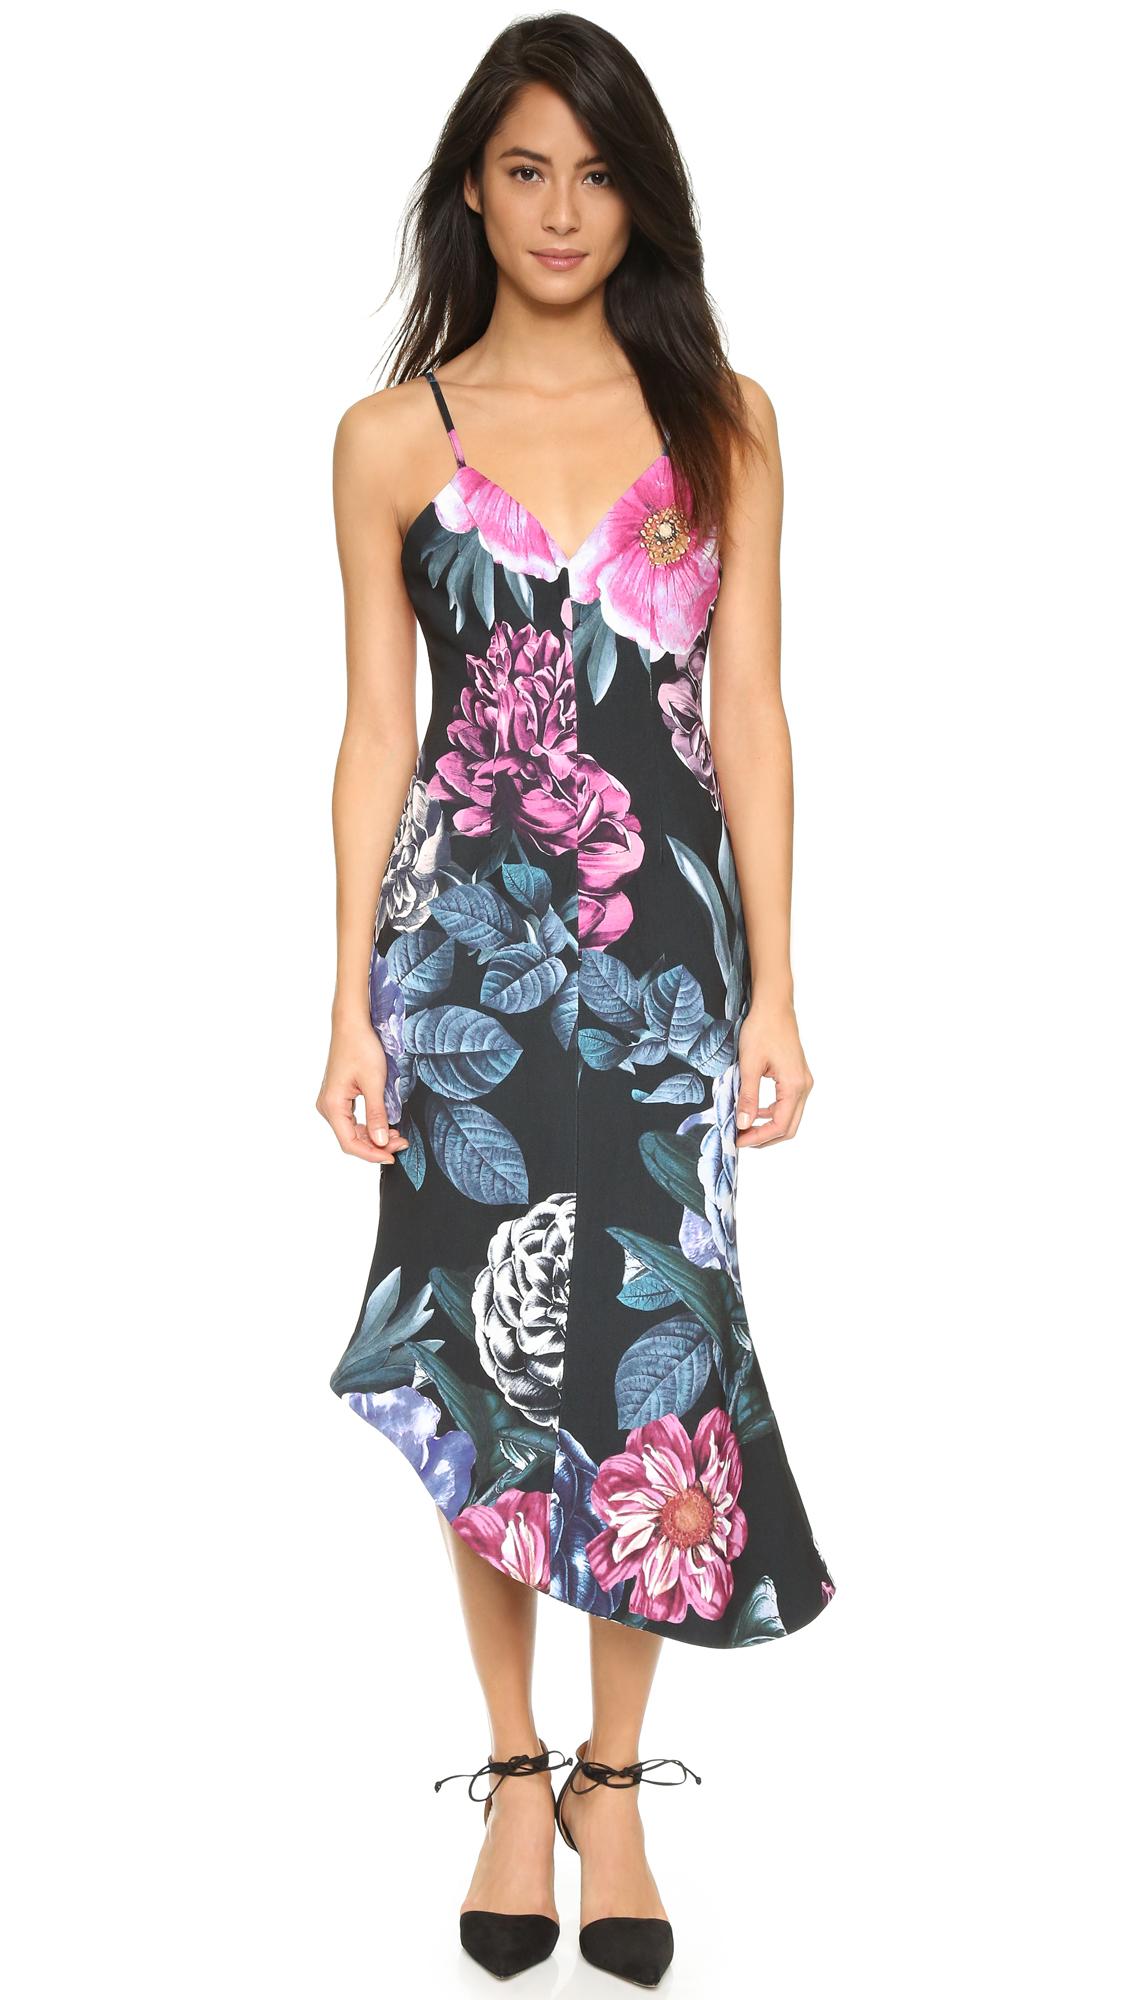 Keepsake Riptide Dress Shopbop